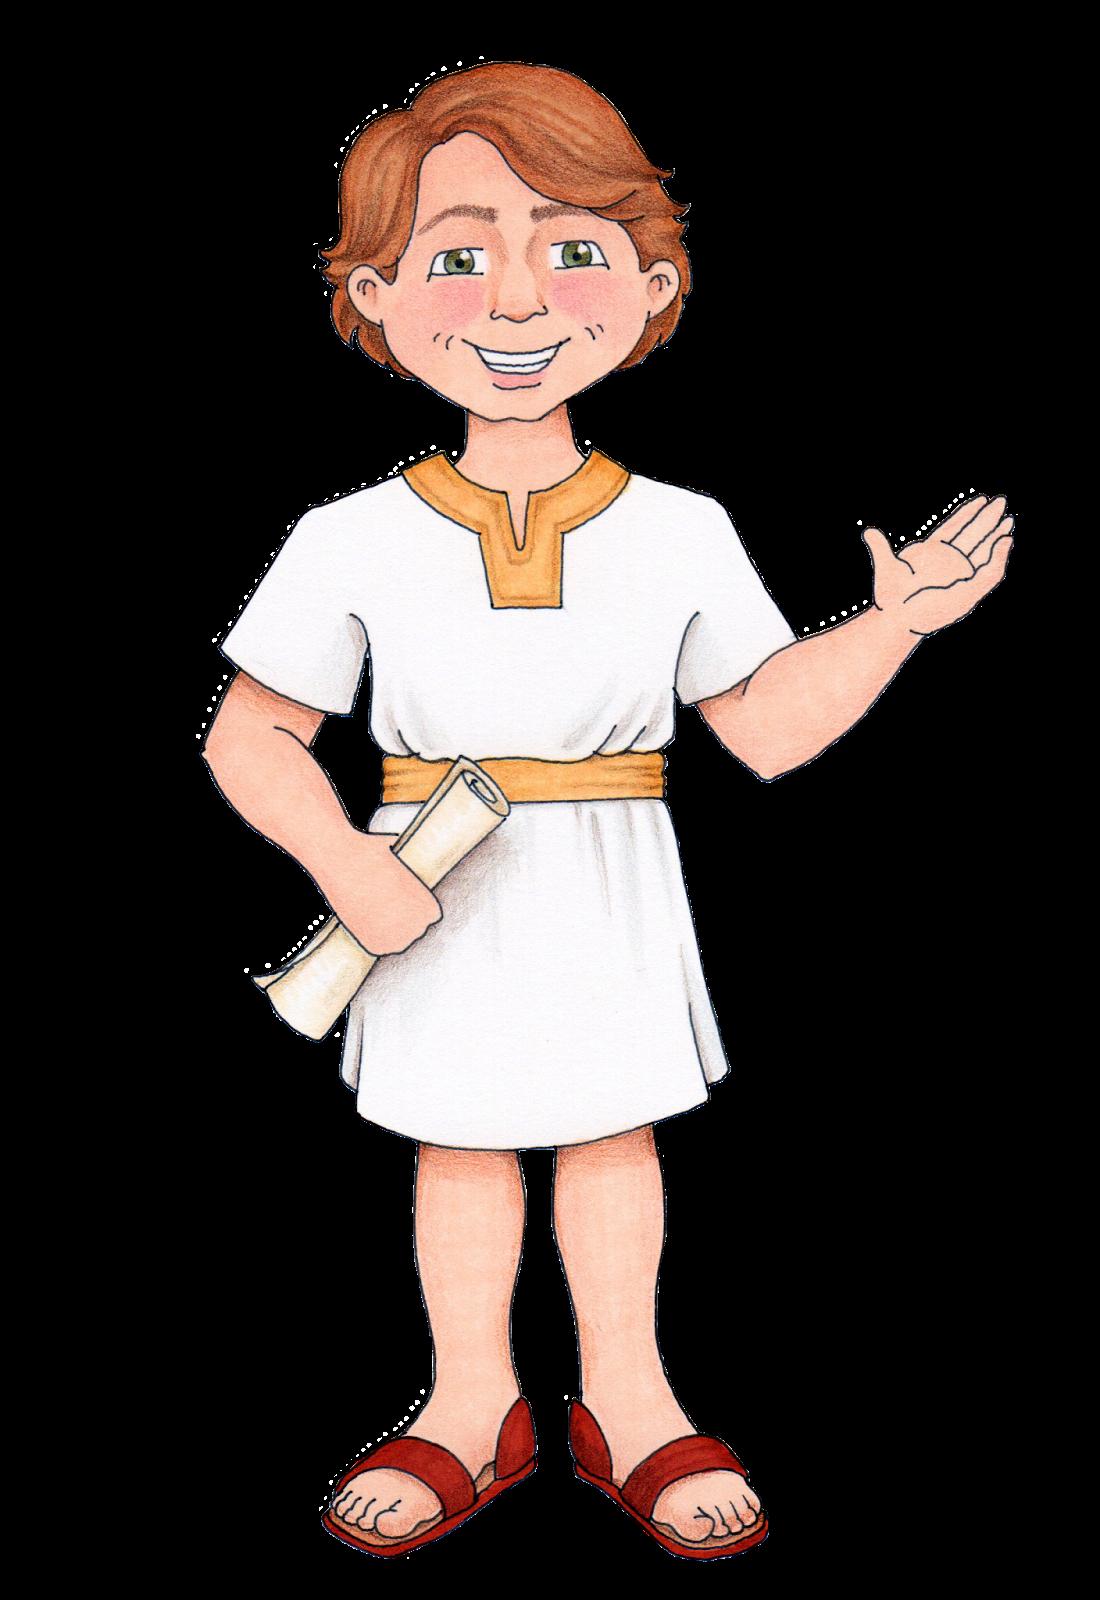 susan fitch design february 2015 rh susanfitchdesign blogspot com LDS Clip Art Jesus LDS Clip Art Repentance